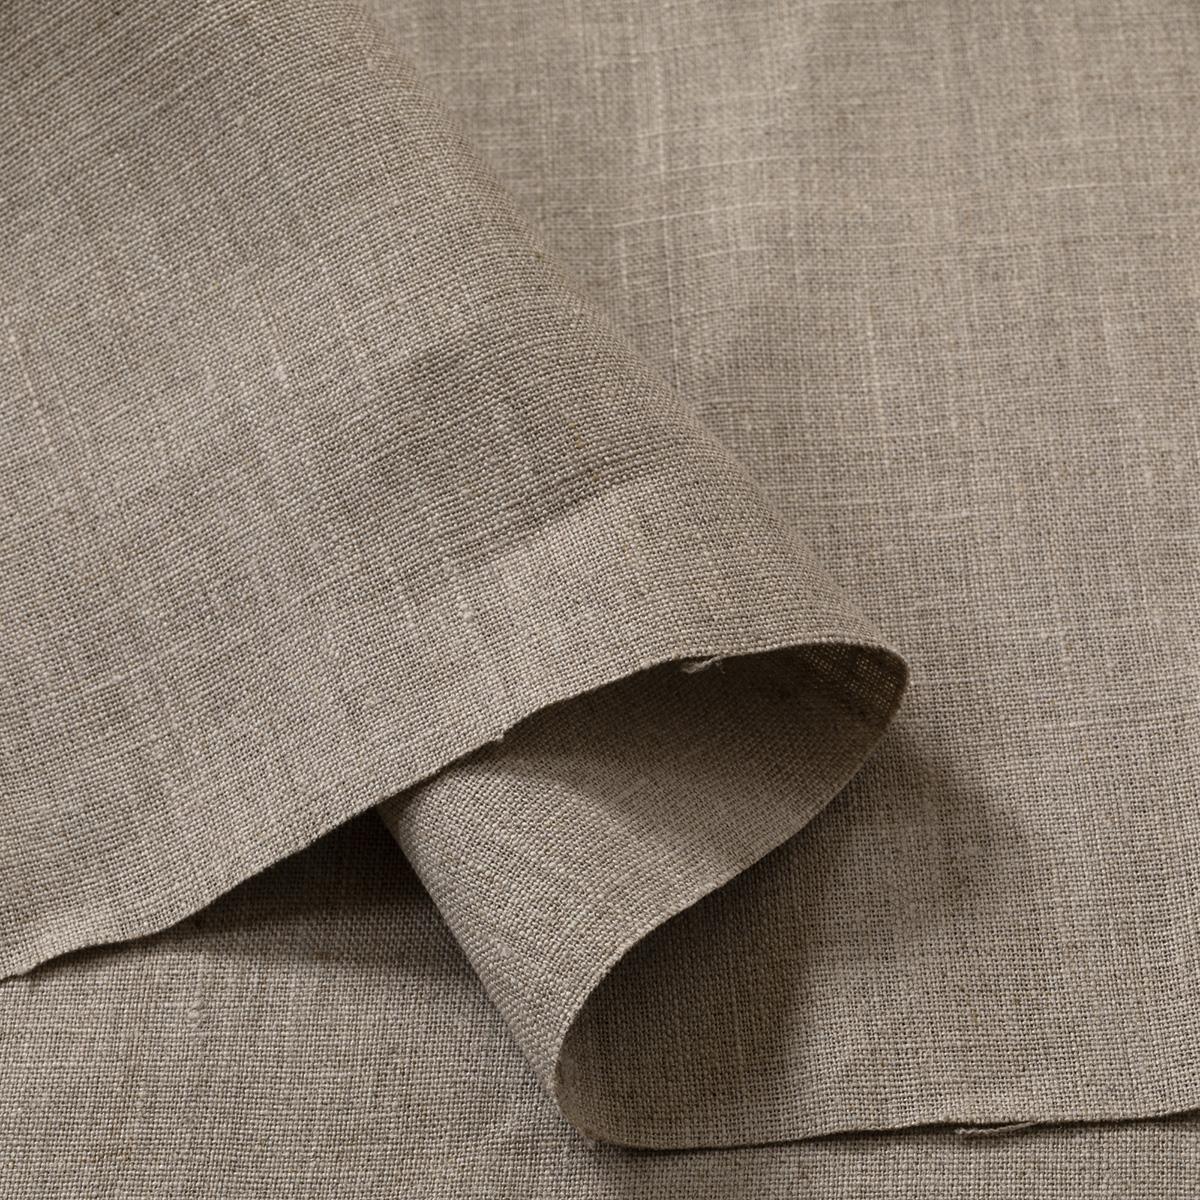 175cm幅 リネン100%生地 ナチュラル 無地 厚地 1m単位 R2159